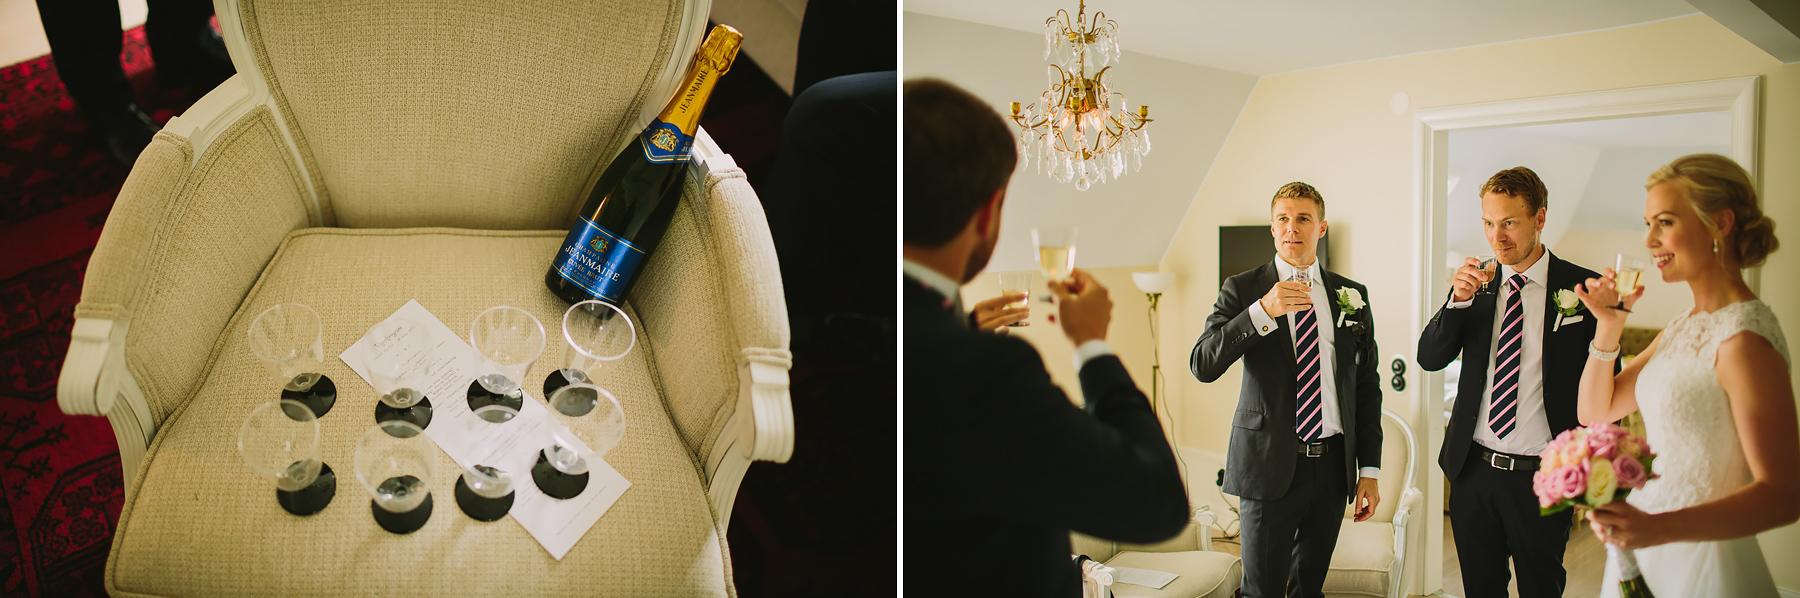 Champagne i plastglas